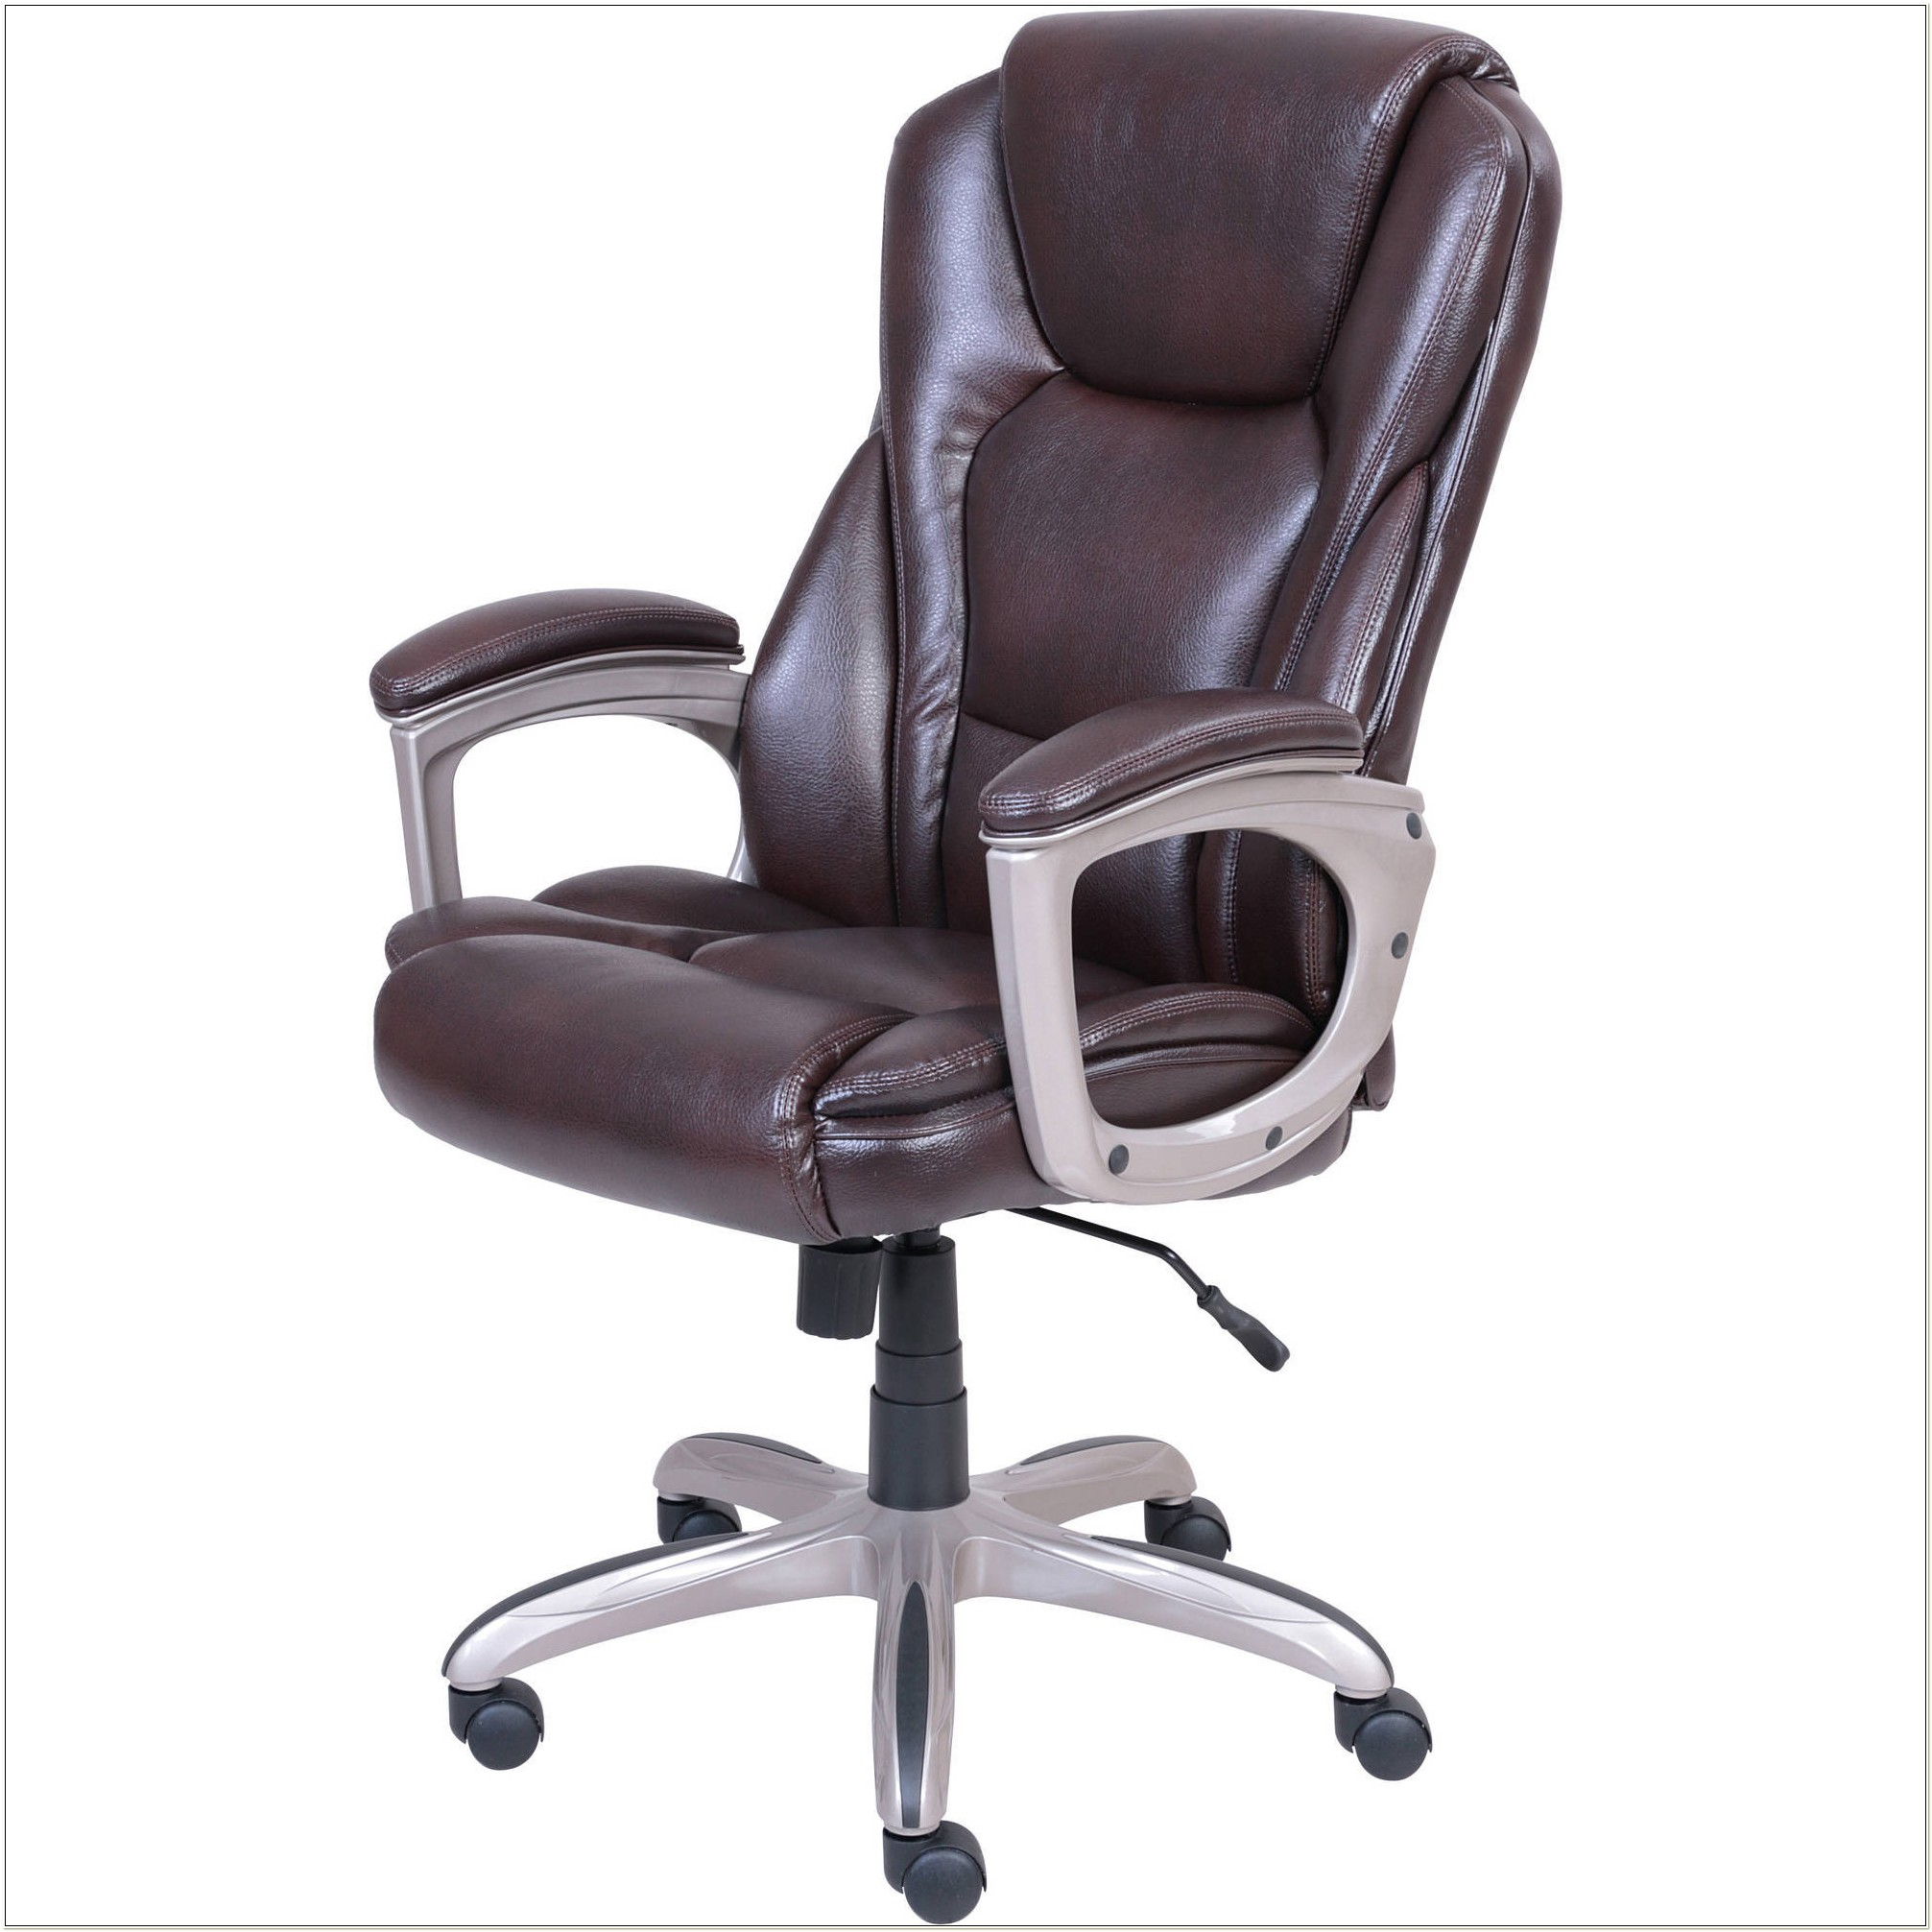 Office Chair Walmart Black Friday